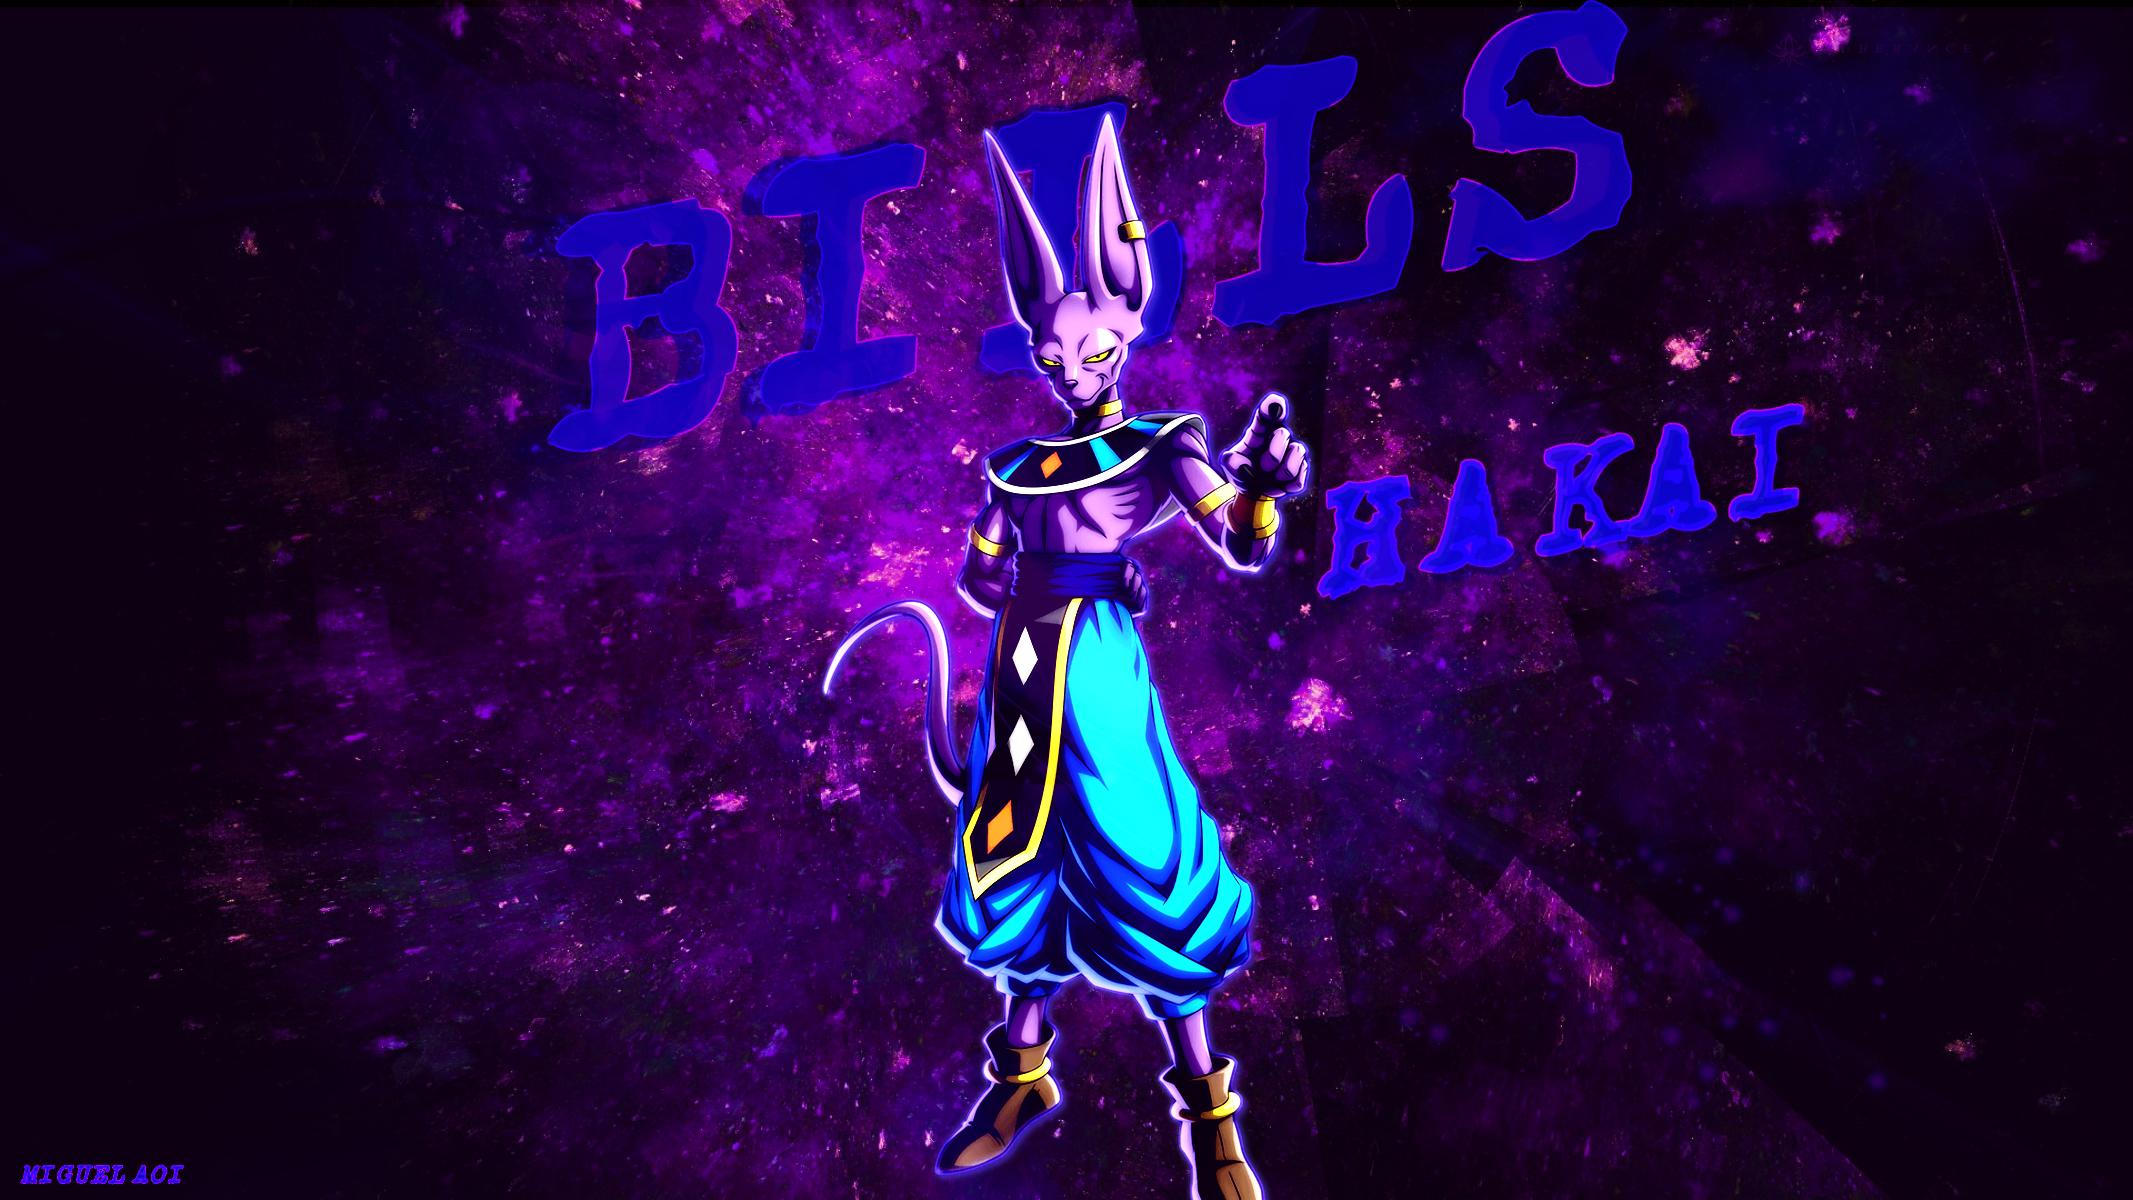 Dragon Ball Super Hd Wallpaper Background Image 2133x1200 Id 922995 Wallpaper Abyss